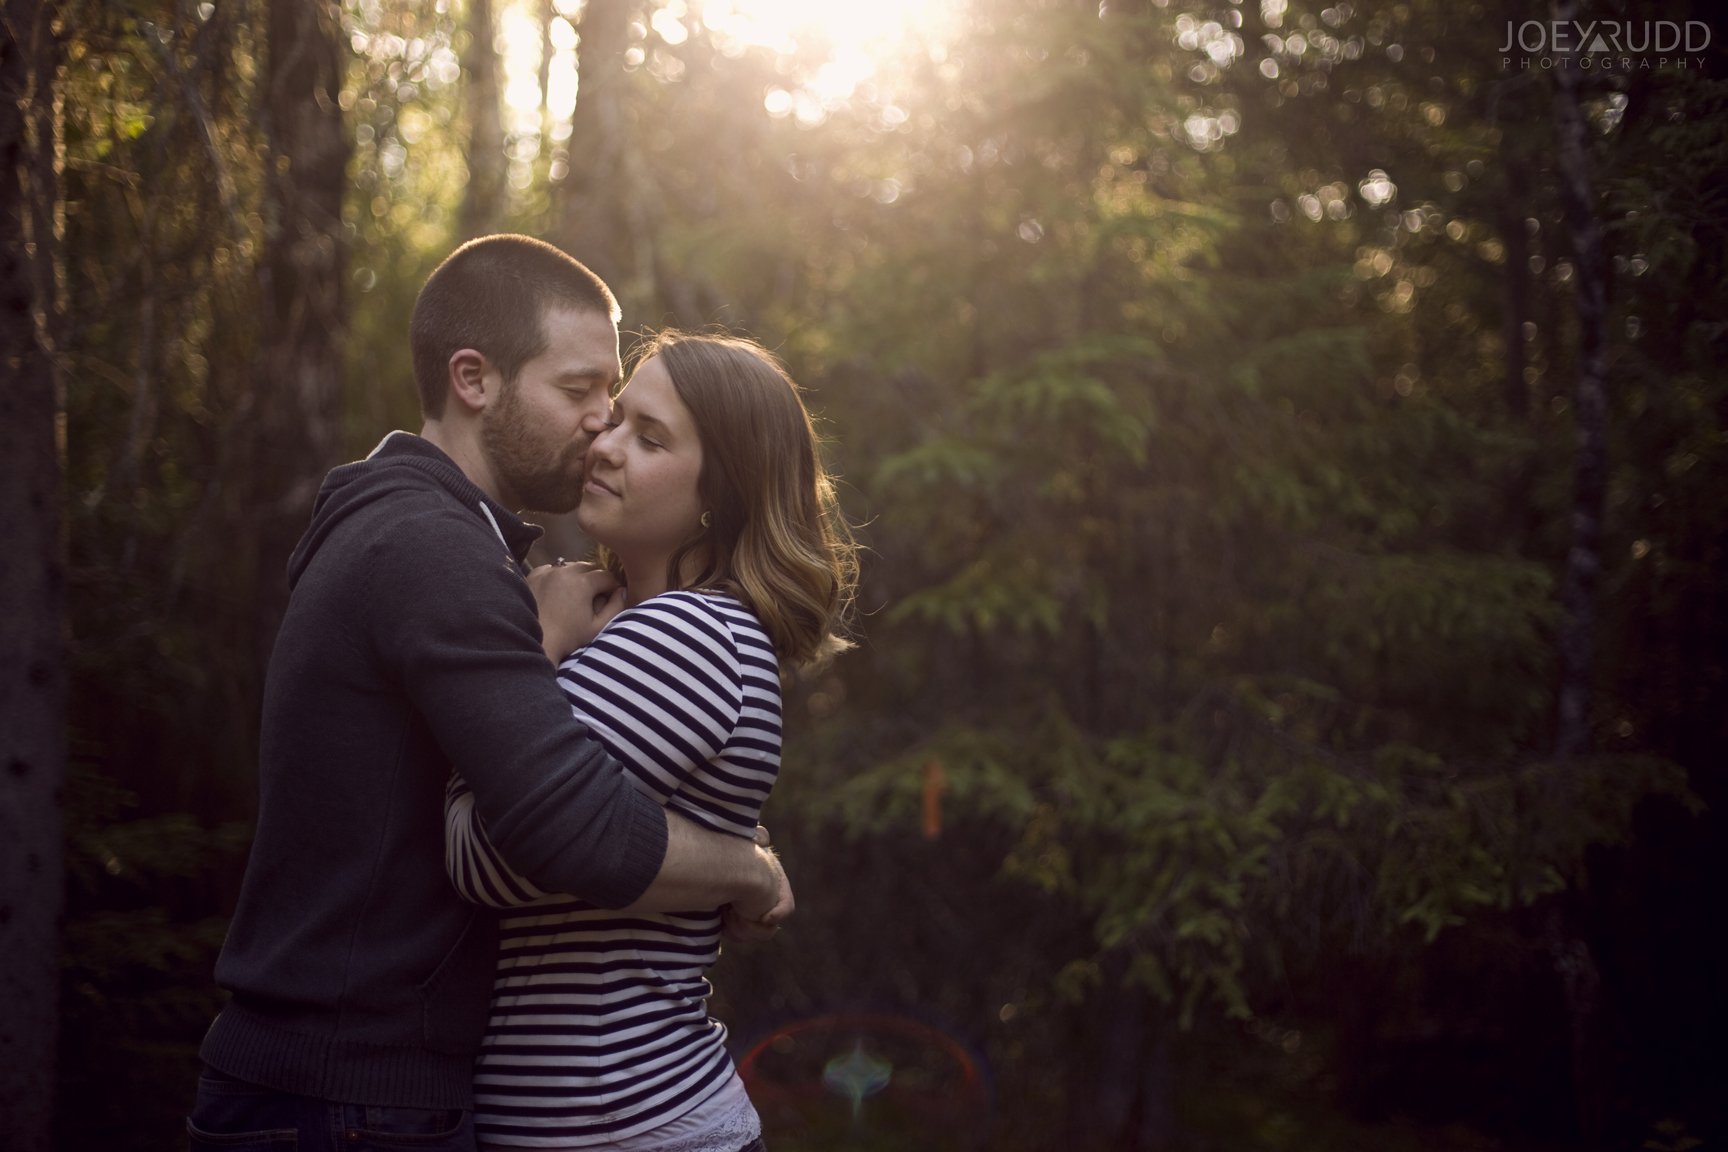 Rustic Engagement by Ottawa Wedding Photographer Joey Rudd Photography Carleton Place Engagement